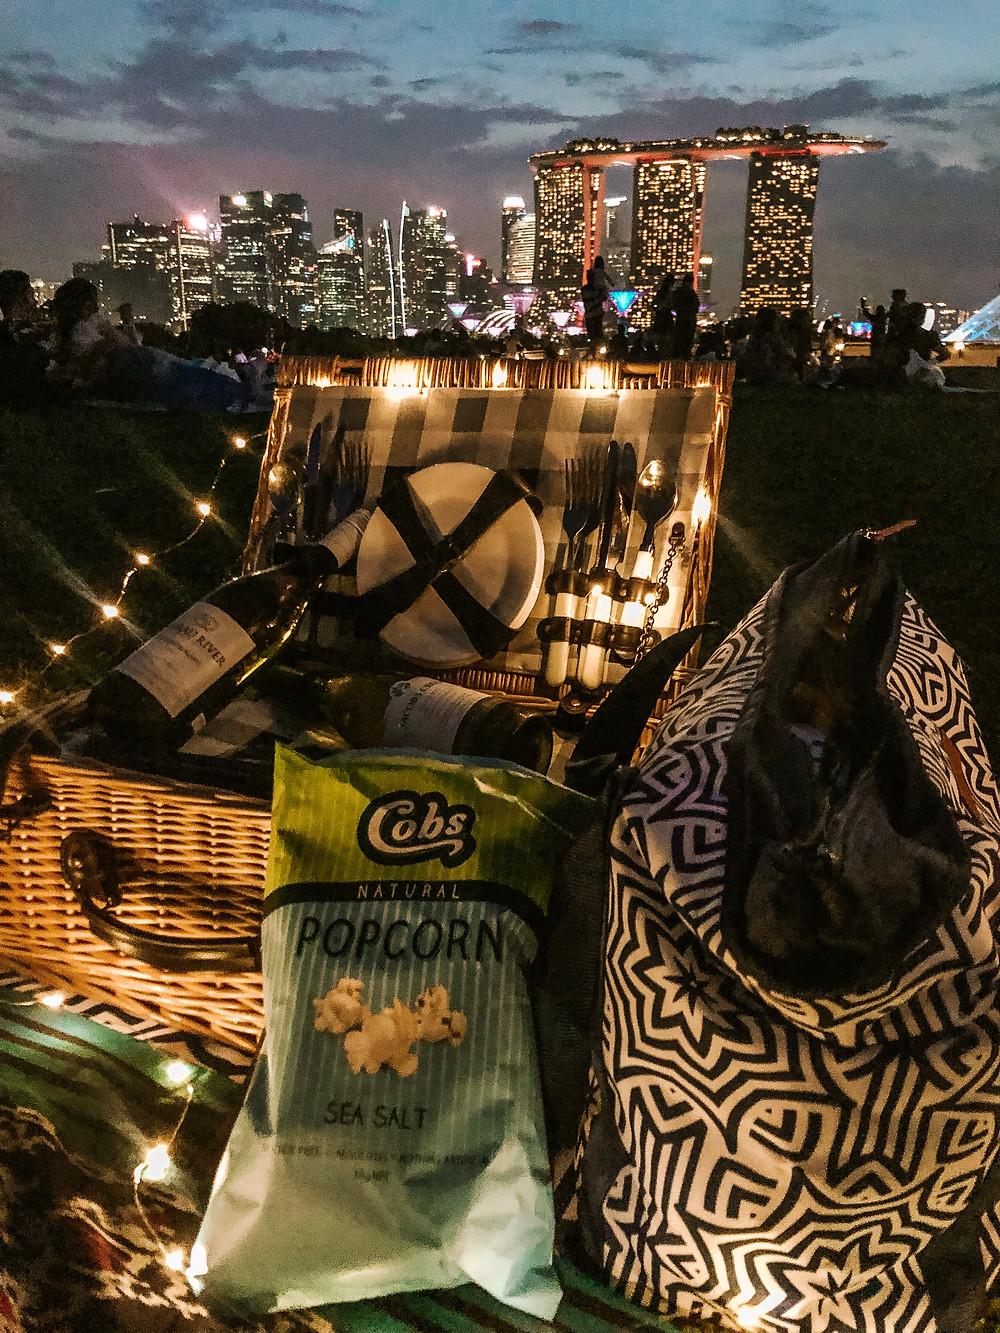 Singapore best picnic spots marina barrage marine bay picnic blanket basket bag